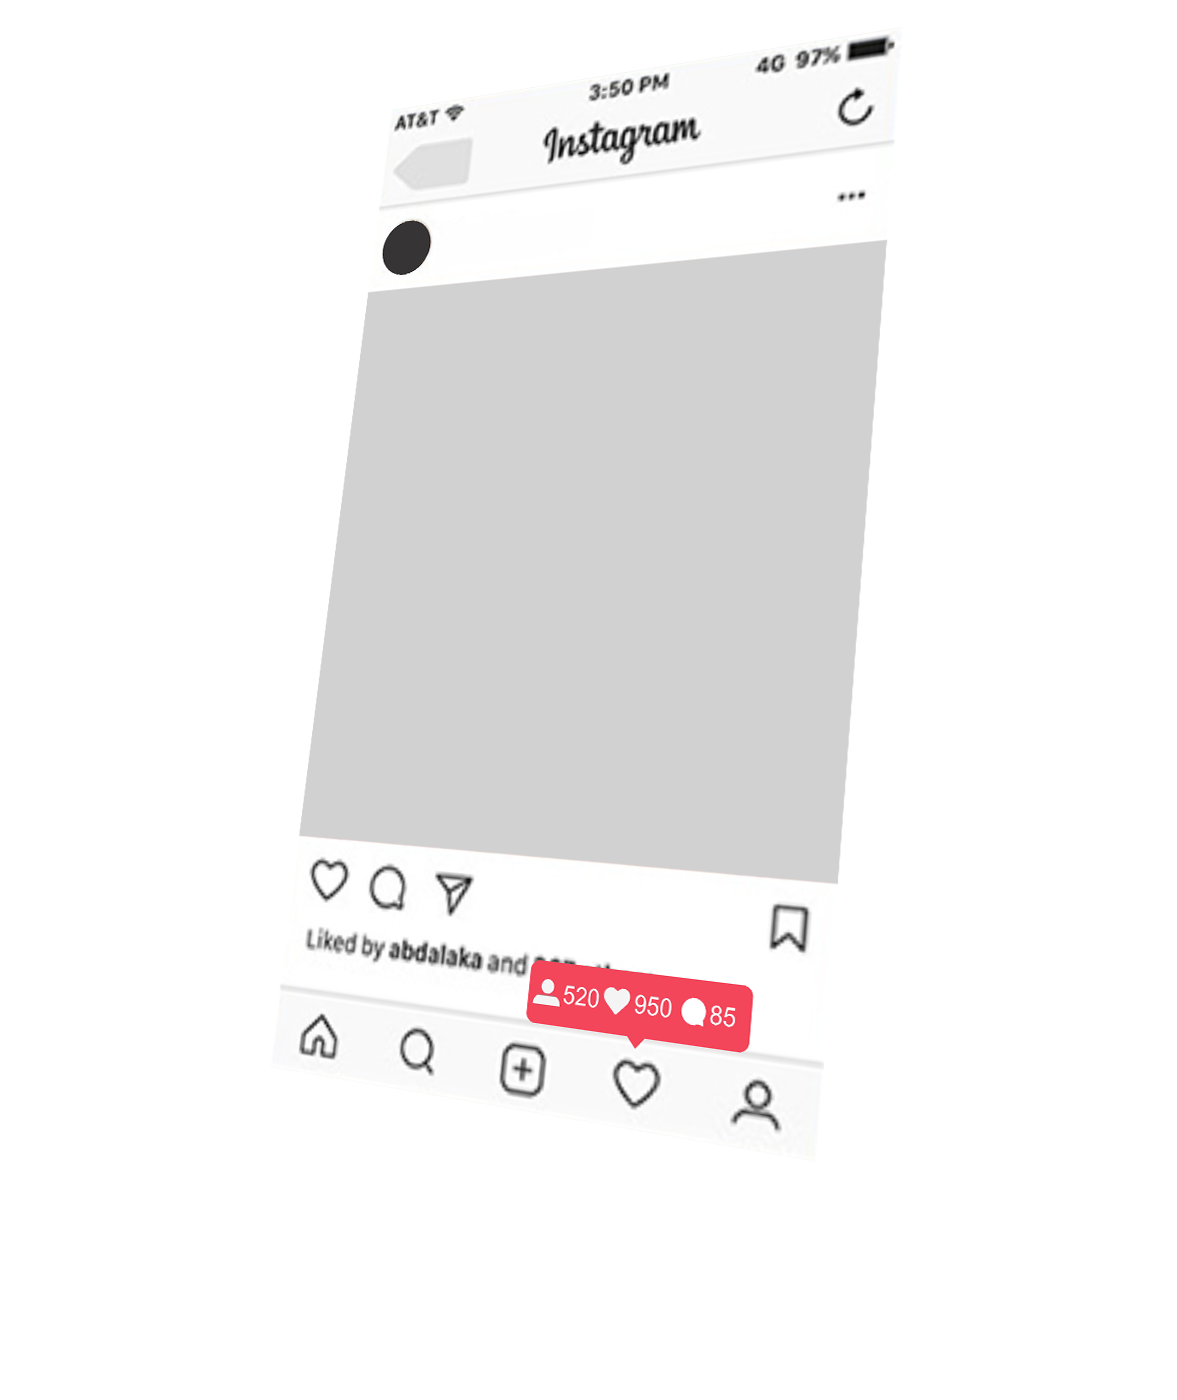 TC EDITZ: 3D edit Instagram.